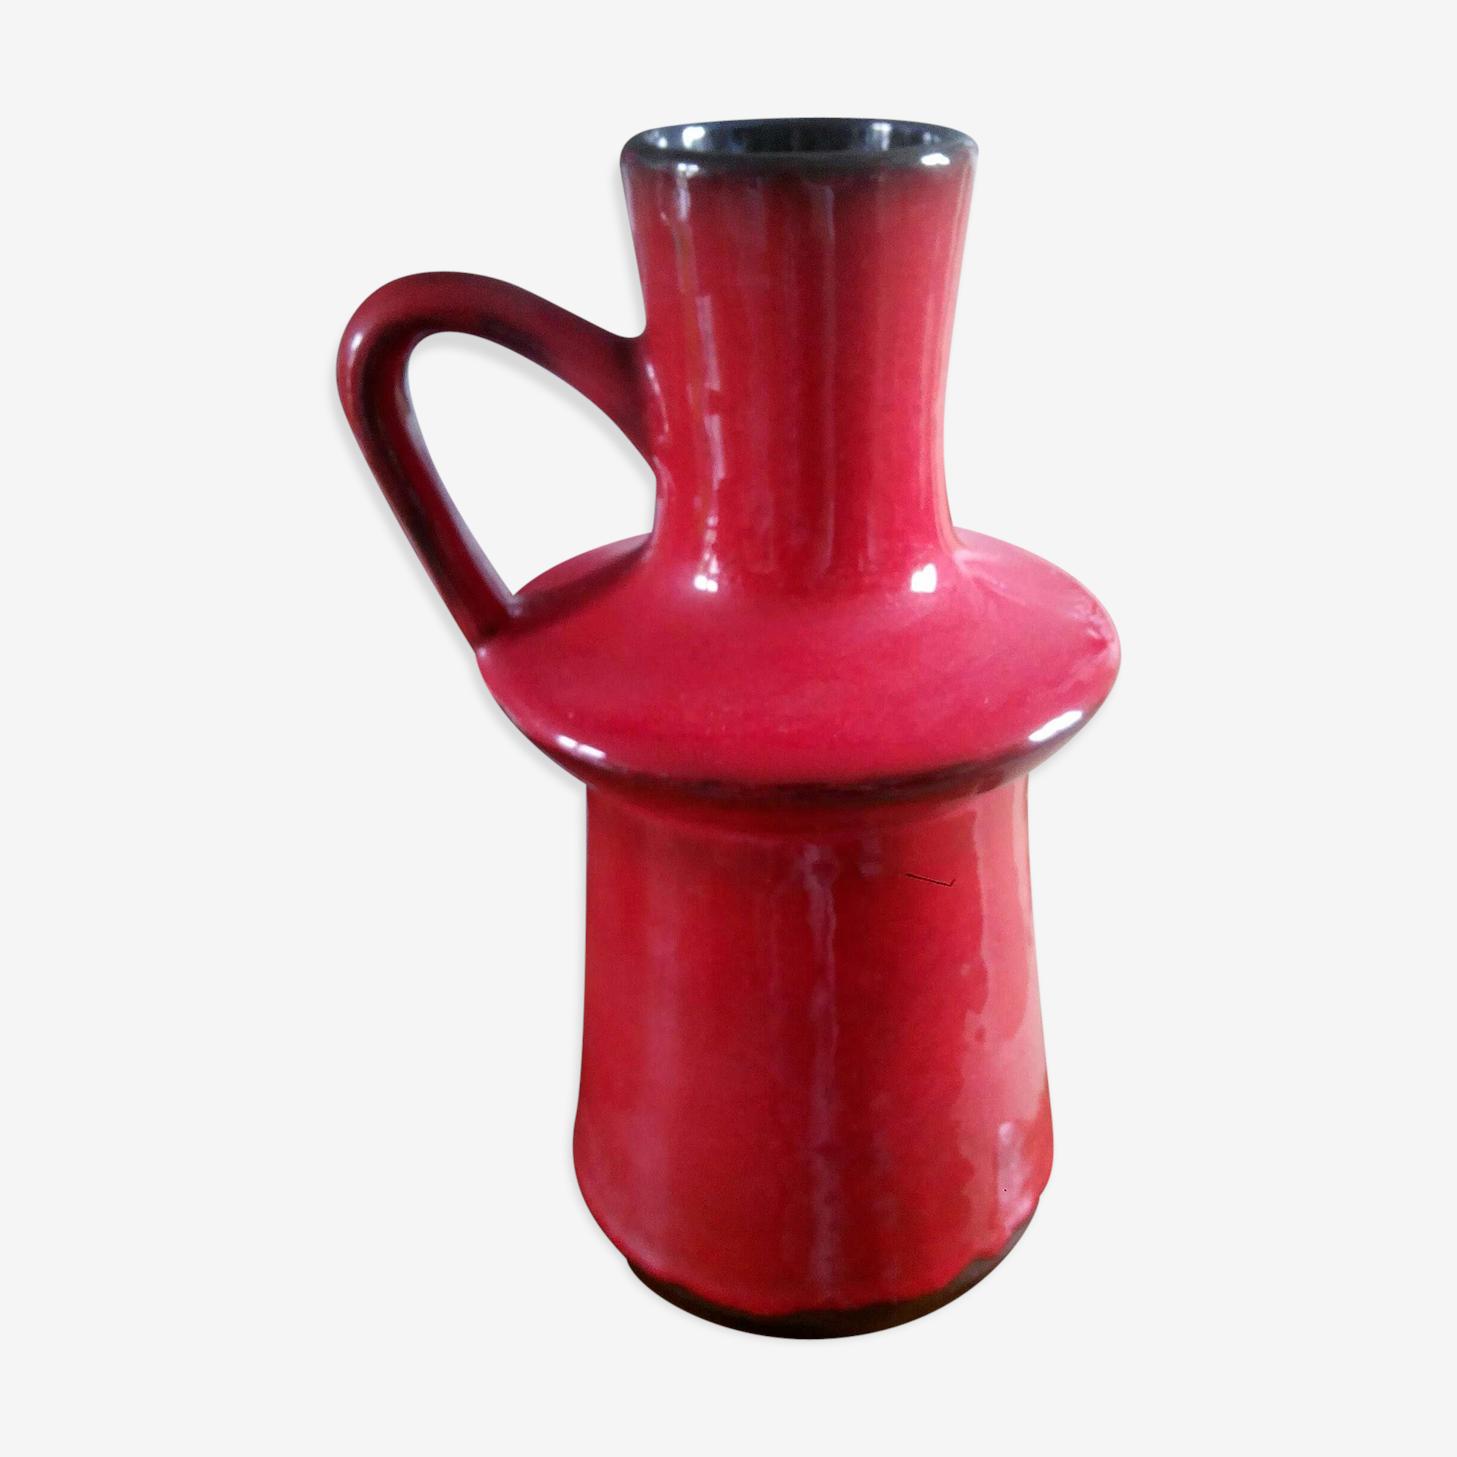 Vase d'origine allemande jopeko keramik vintage